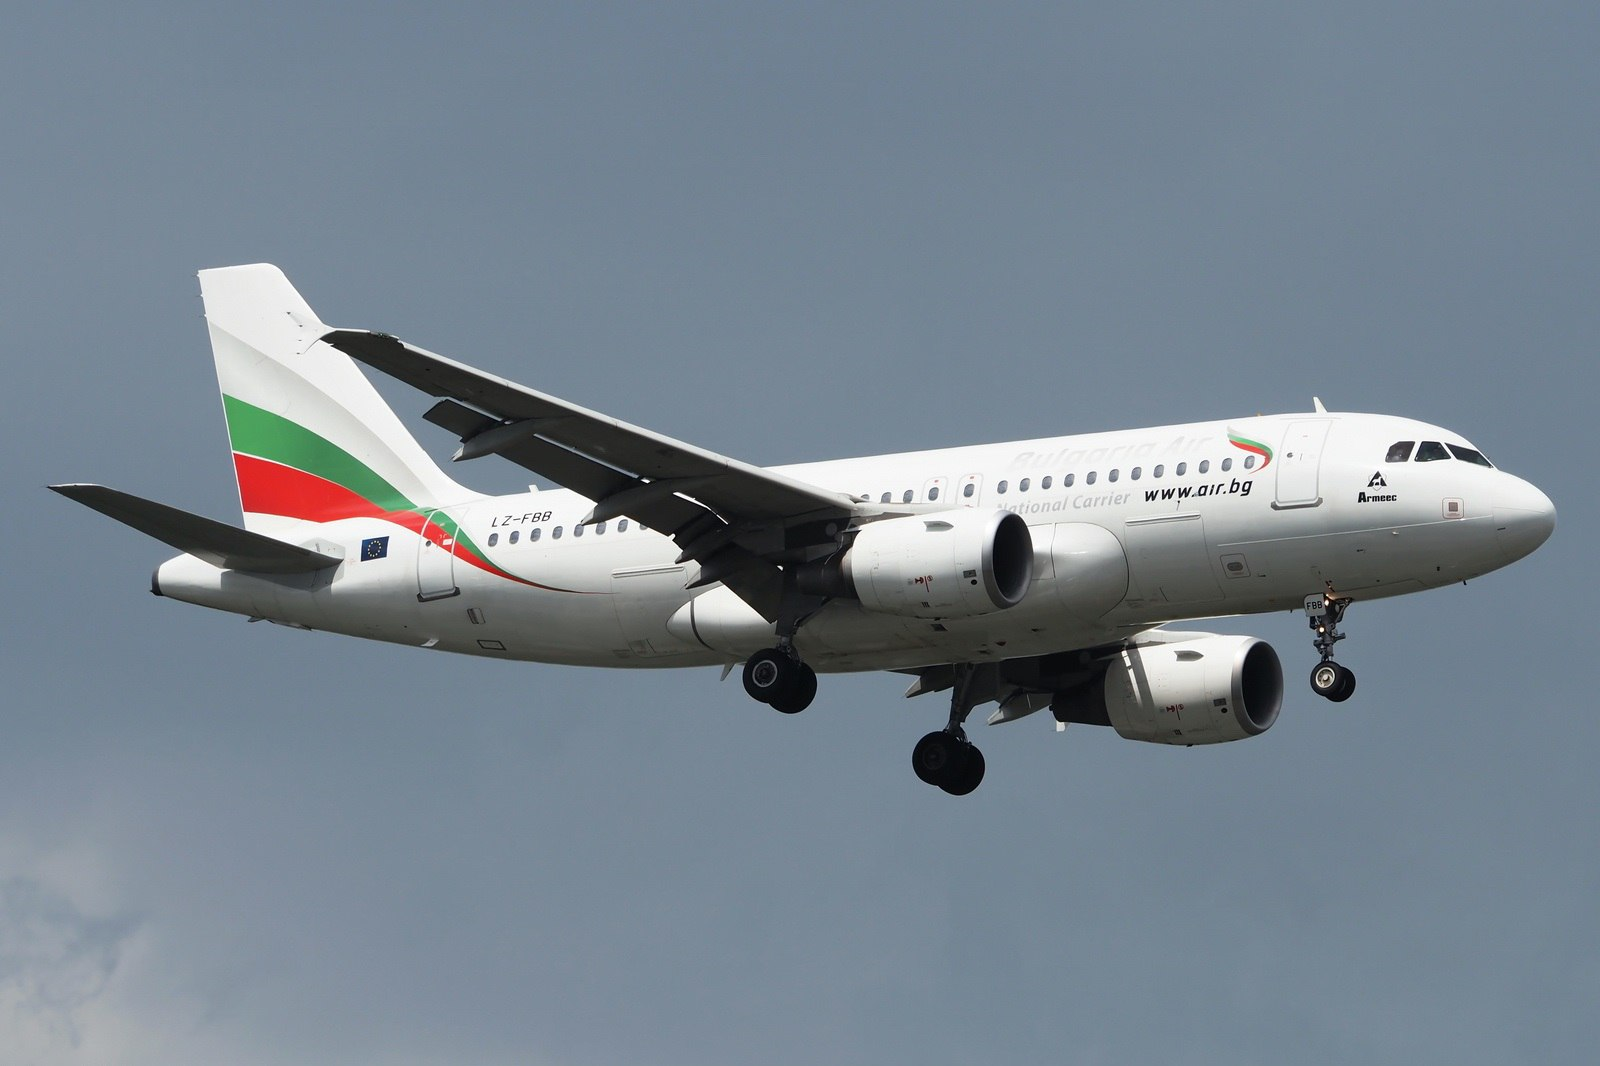 Аэробус Bulgaria Air в небе